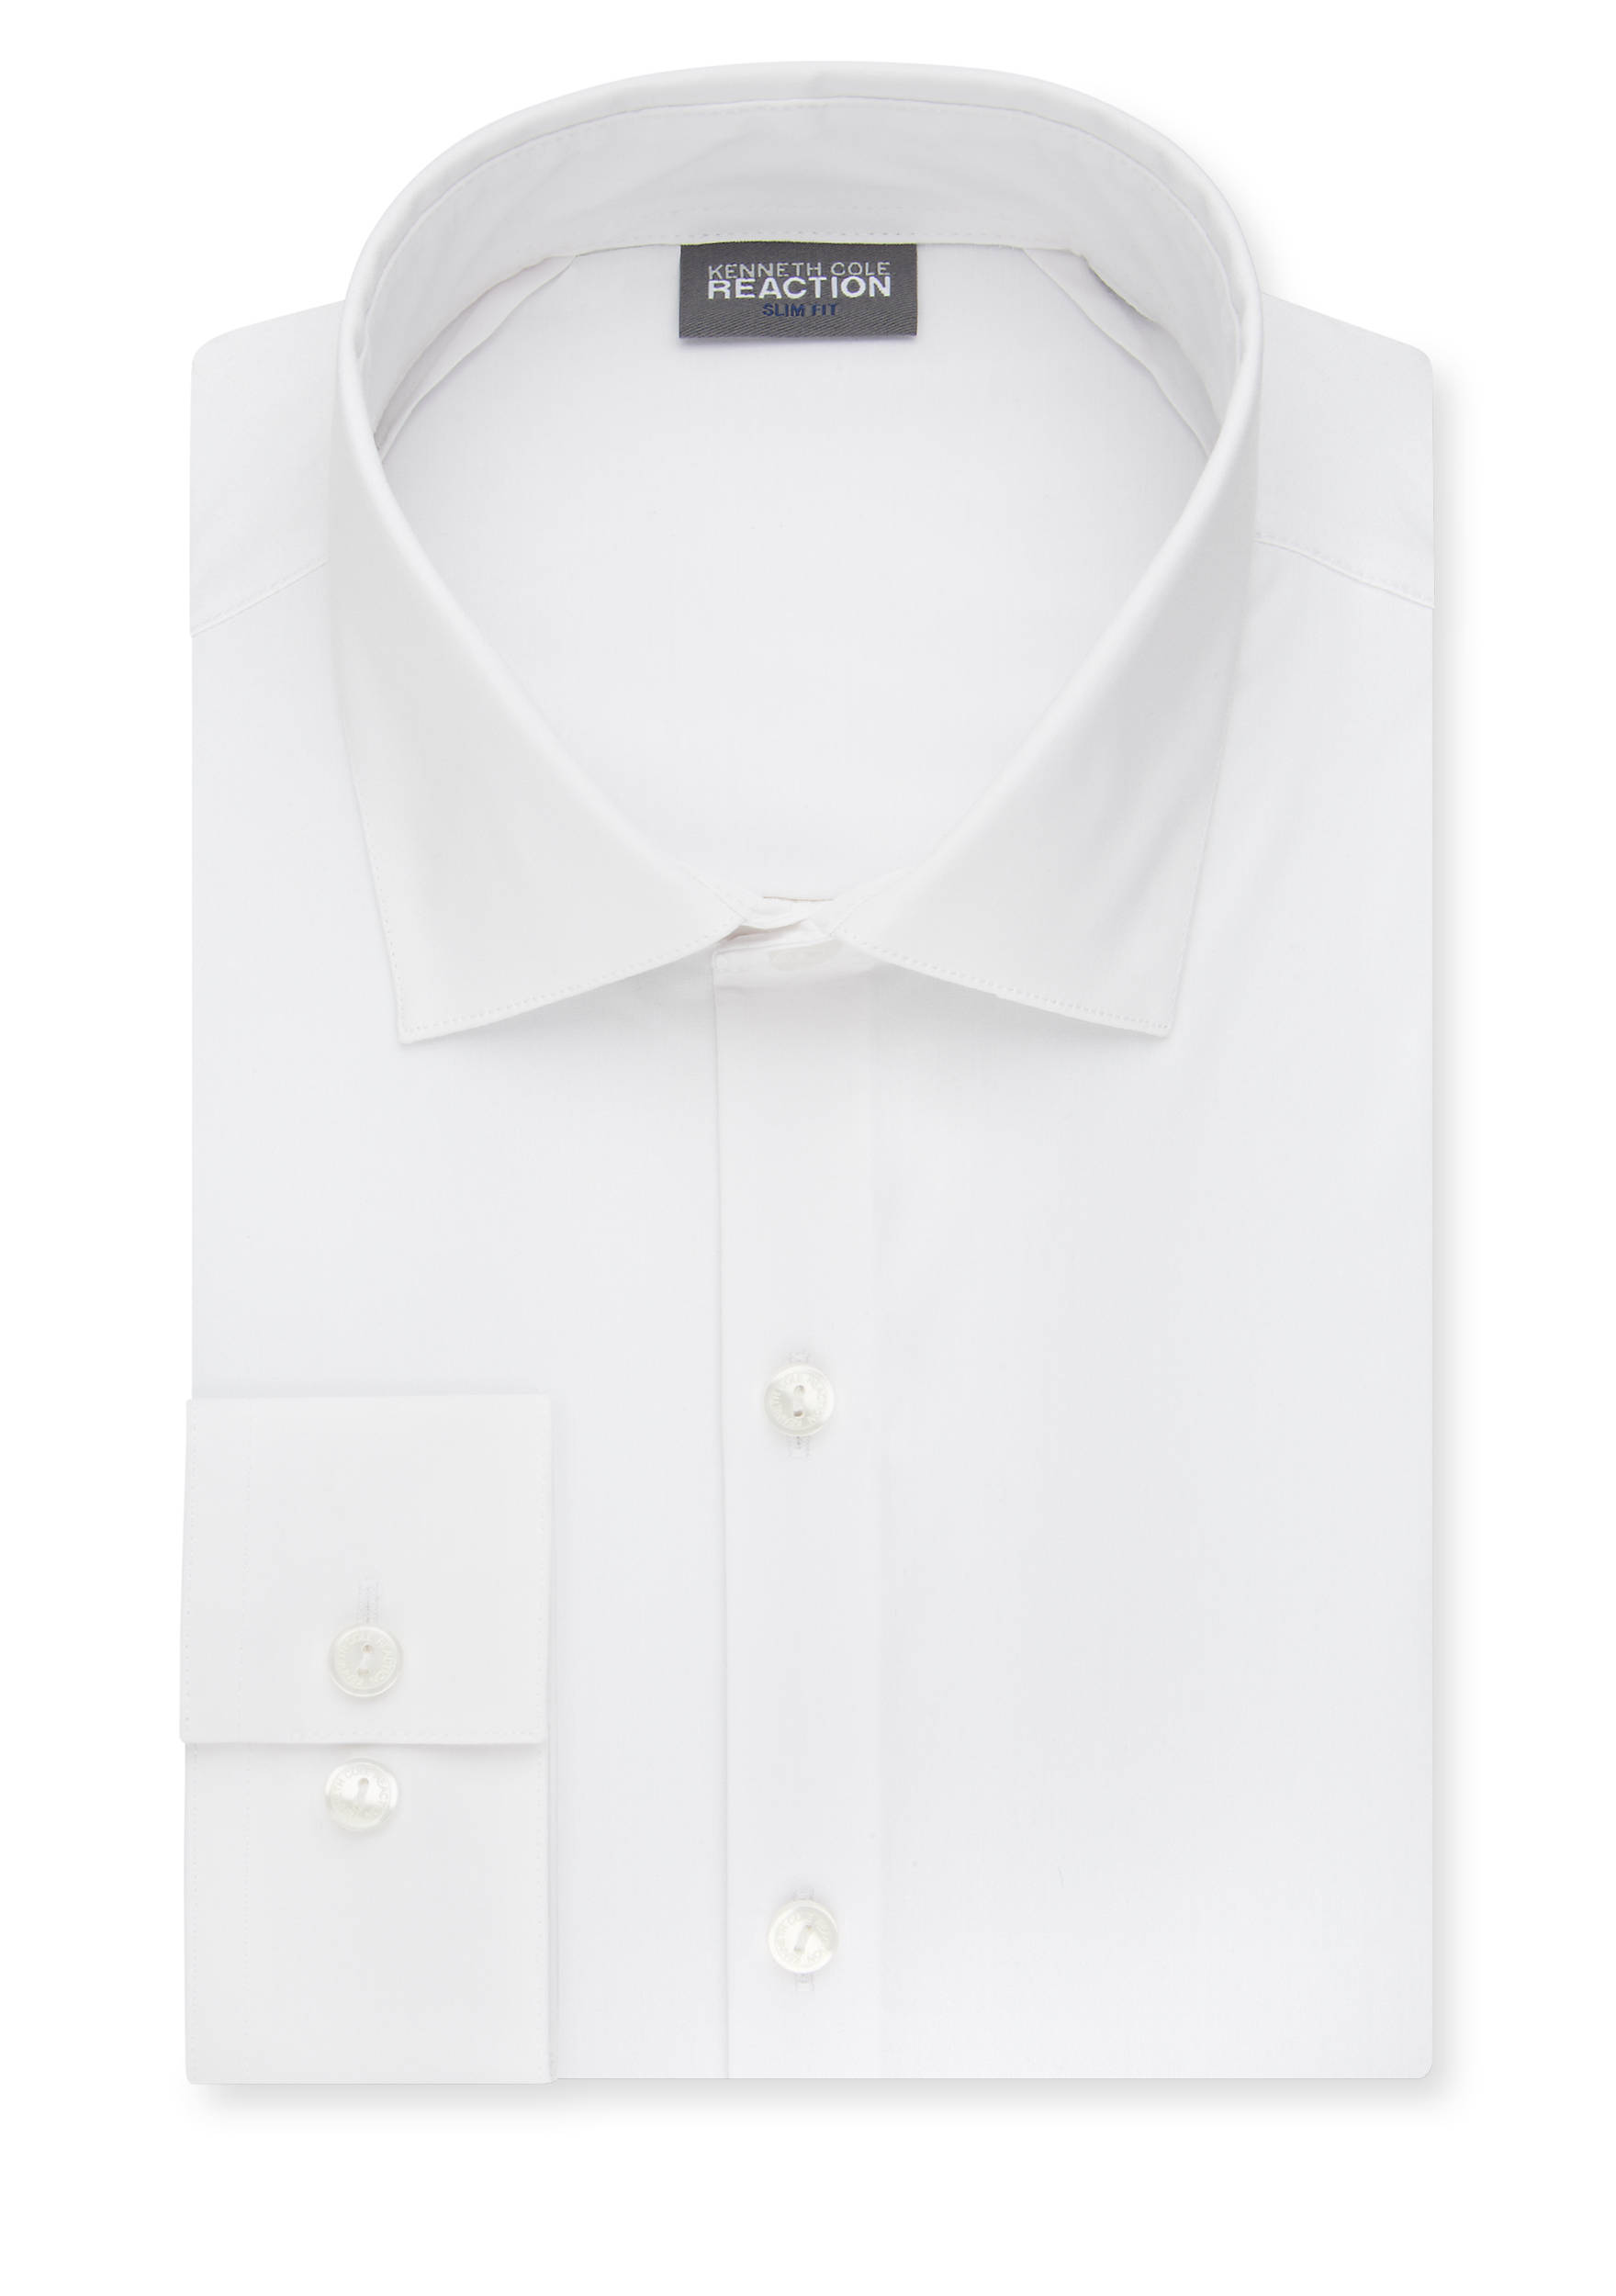 Kenneth Cole Reaction Slim-Fit Techni-Cole Stretch Dress Shirt | belk